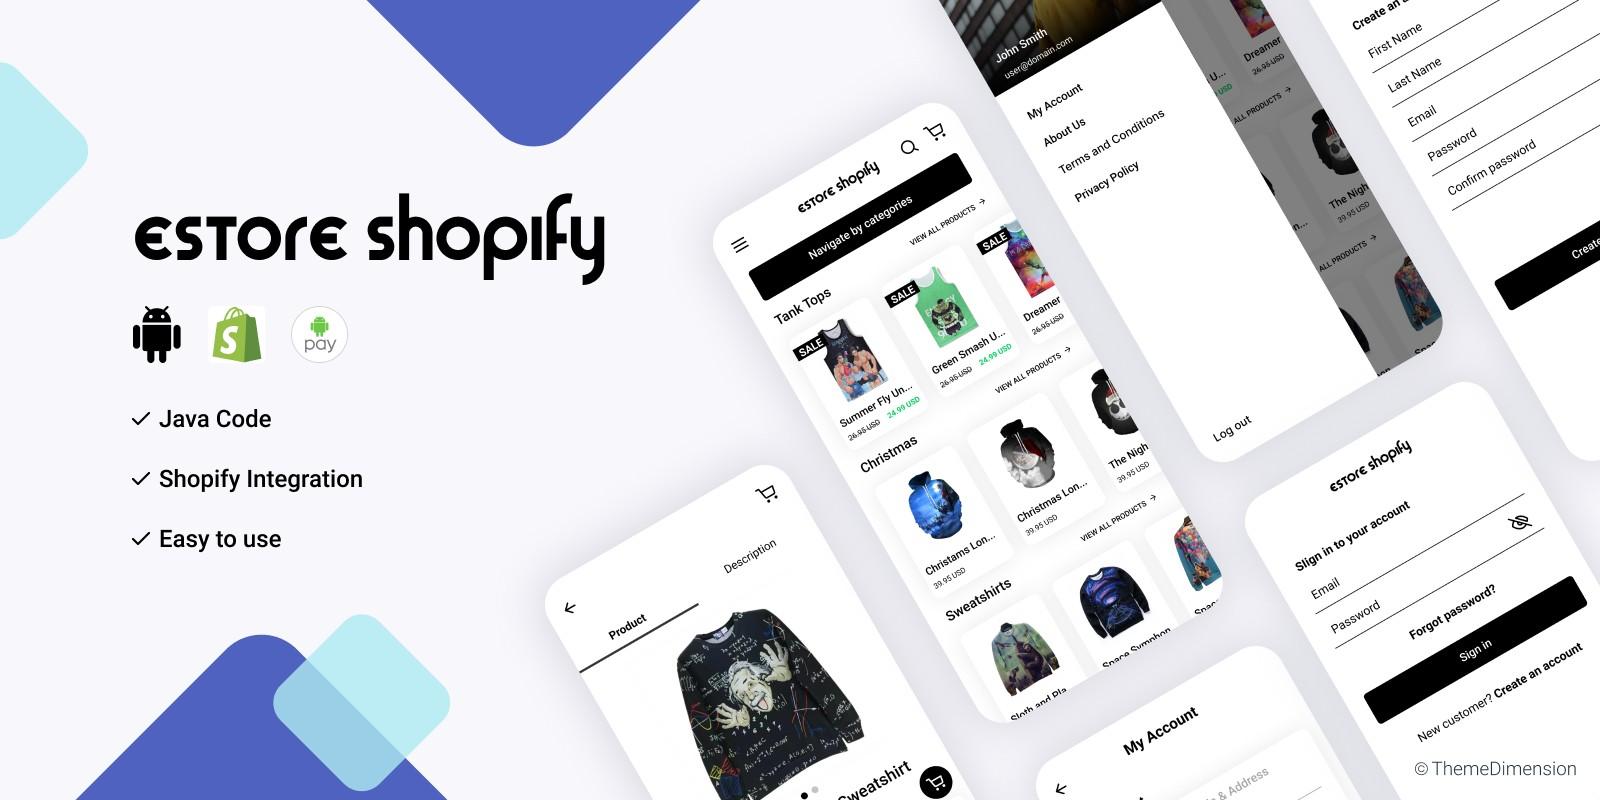 eStore Shopify - Android App Source Code